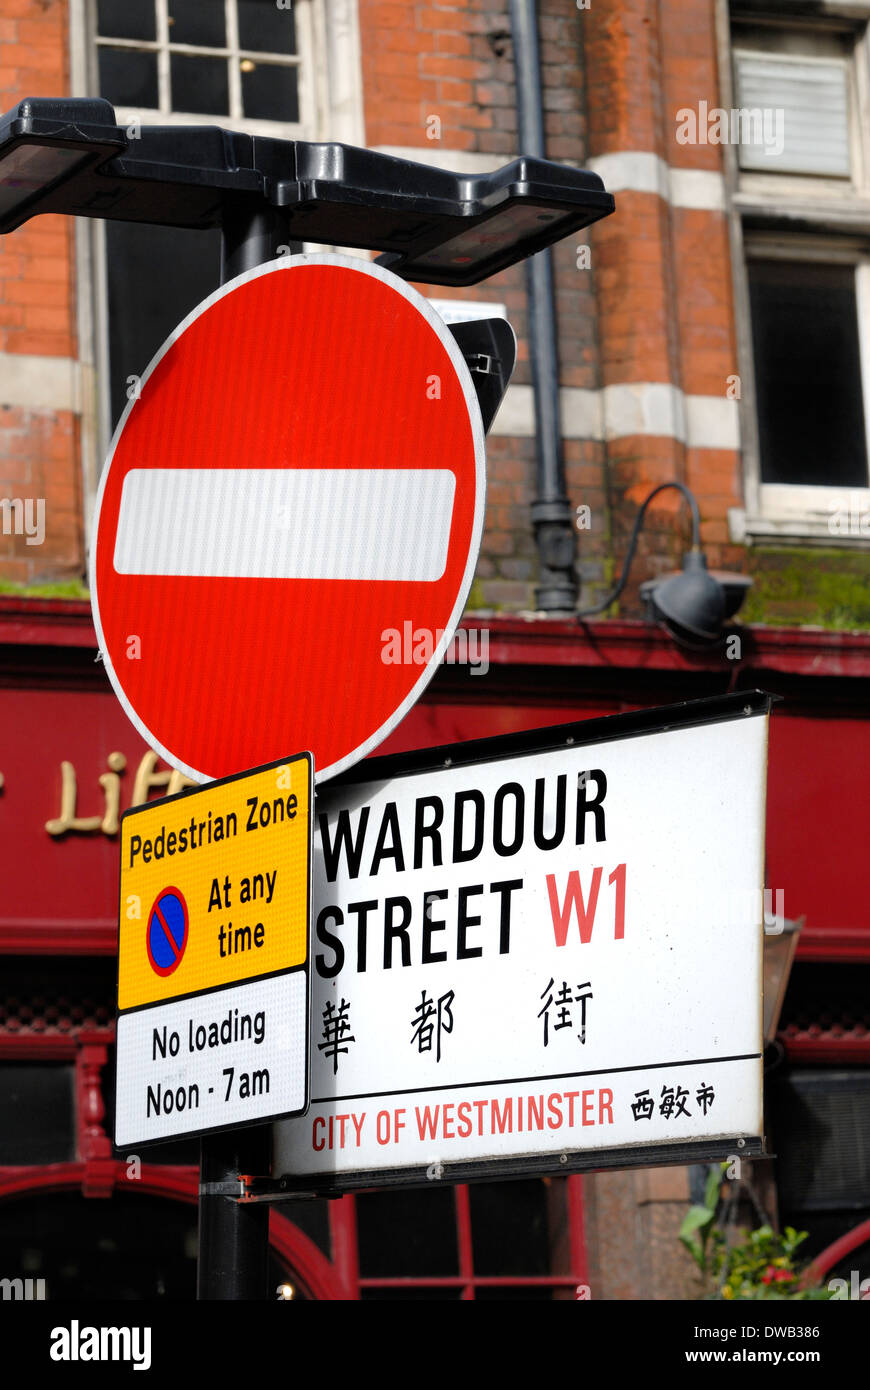 London, England, UK. Street signs in Wardour Street, Chinatown - Stock Image